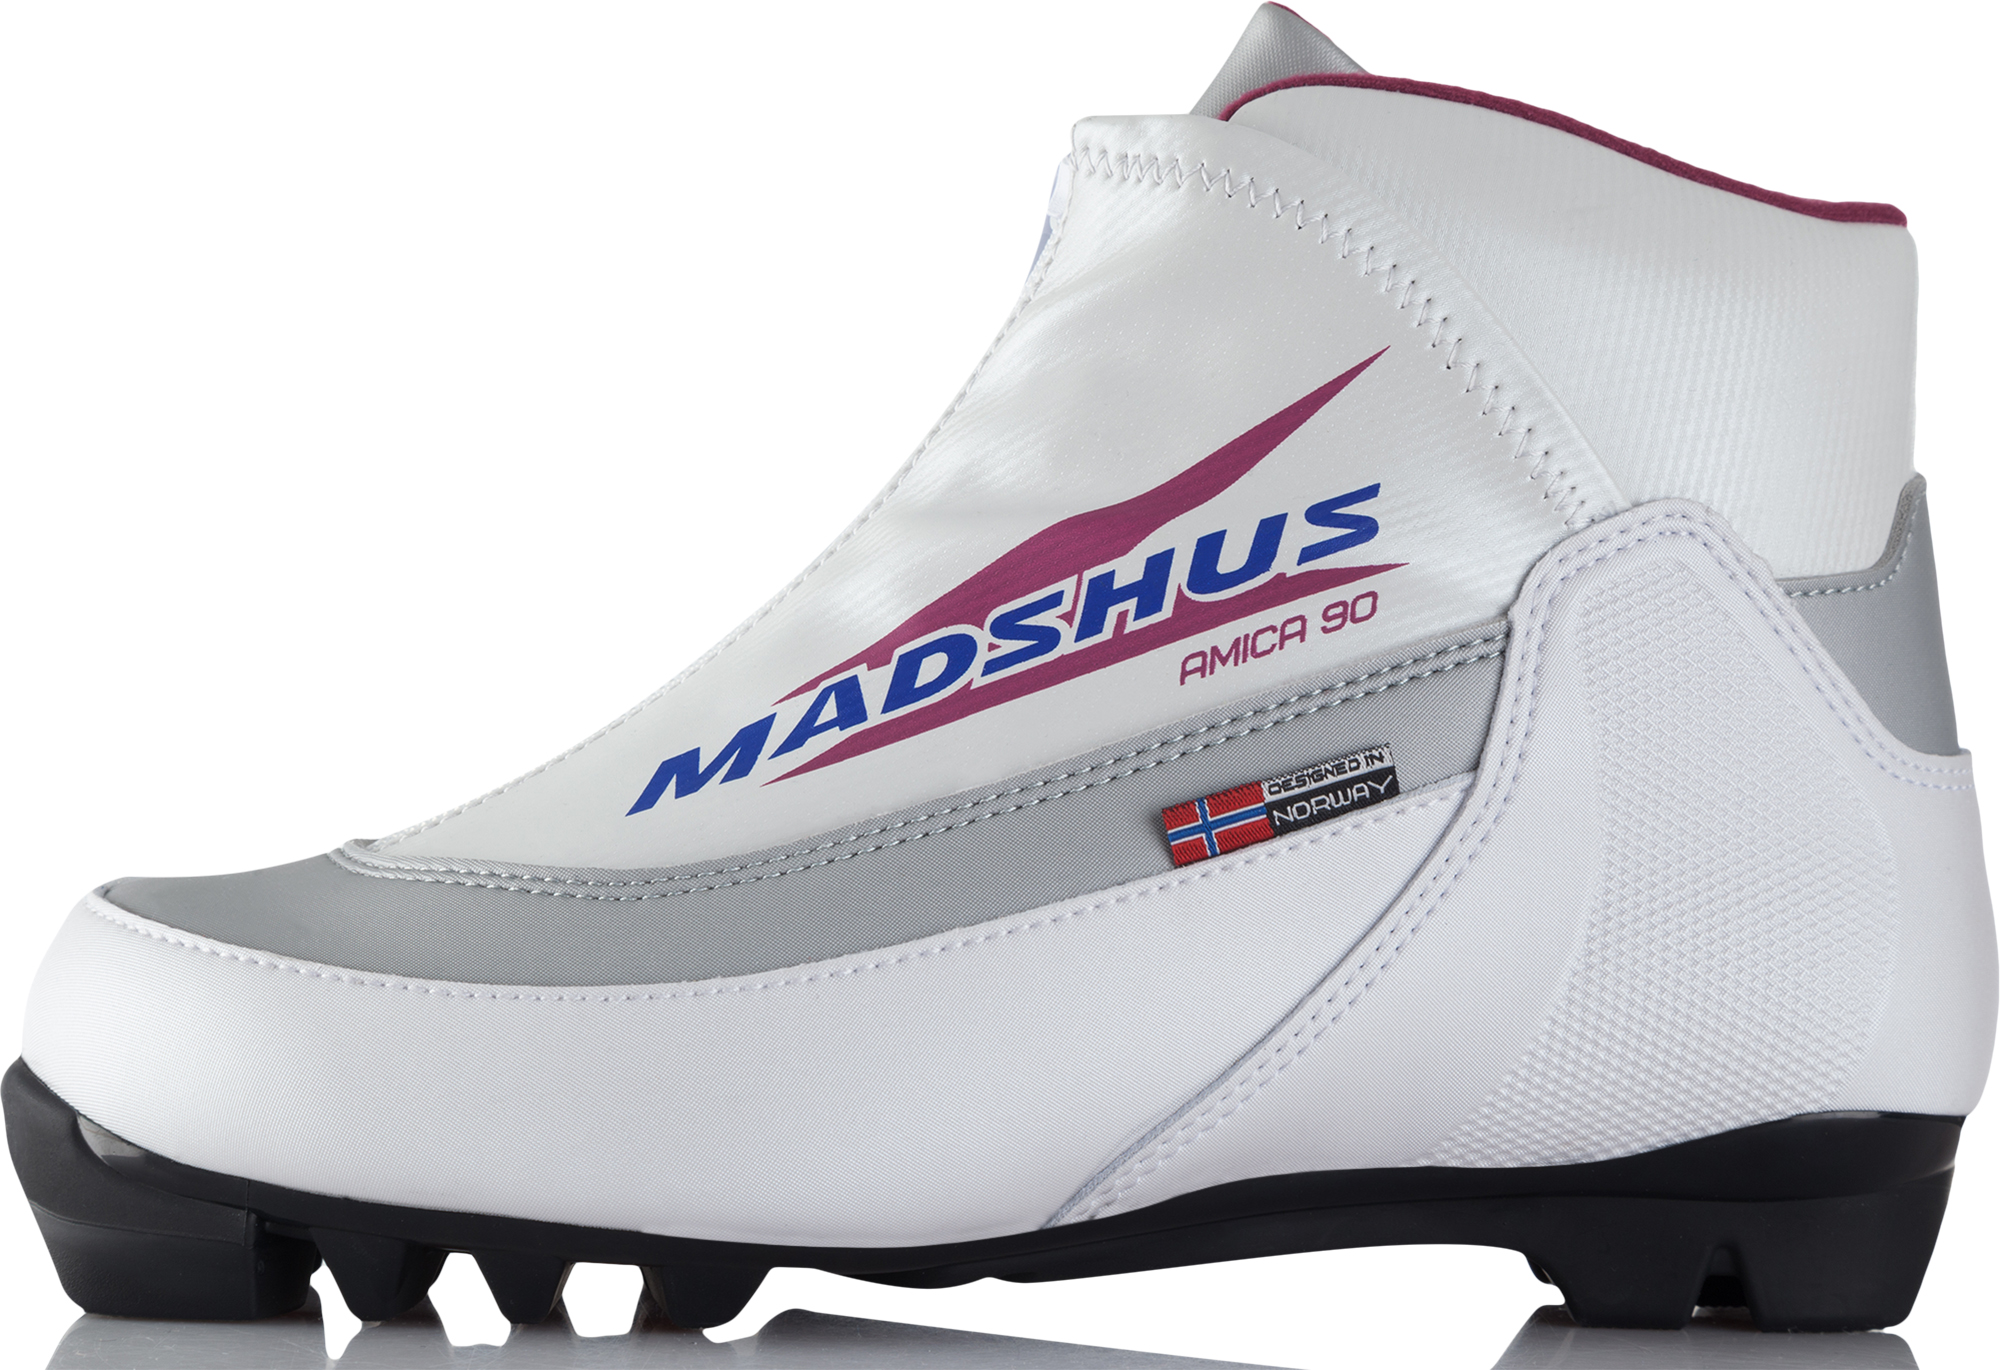 Madshus Ботинки для беговых лыж женские Madshus Amica 90 женские пуховики куртки new brand 90